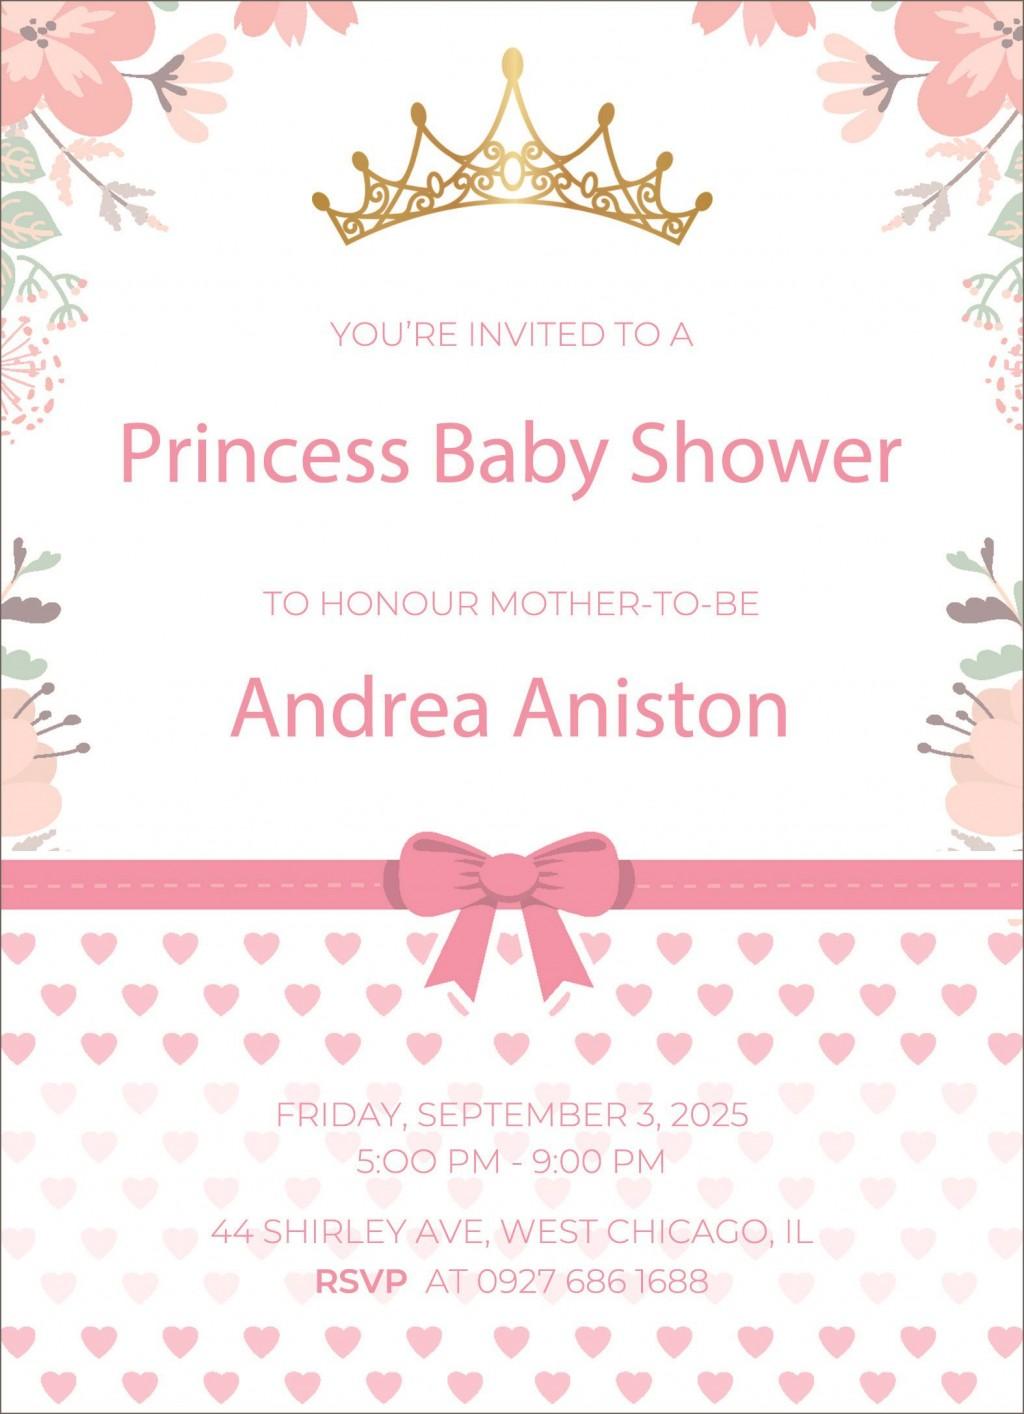 005 Shocking Microsoft Word Invitation Template Baby Shower Example  Free Editable InviteLarge